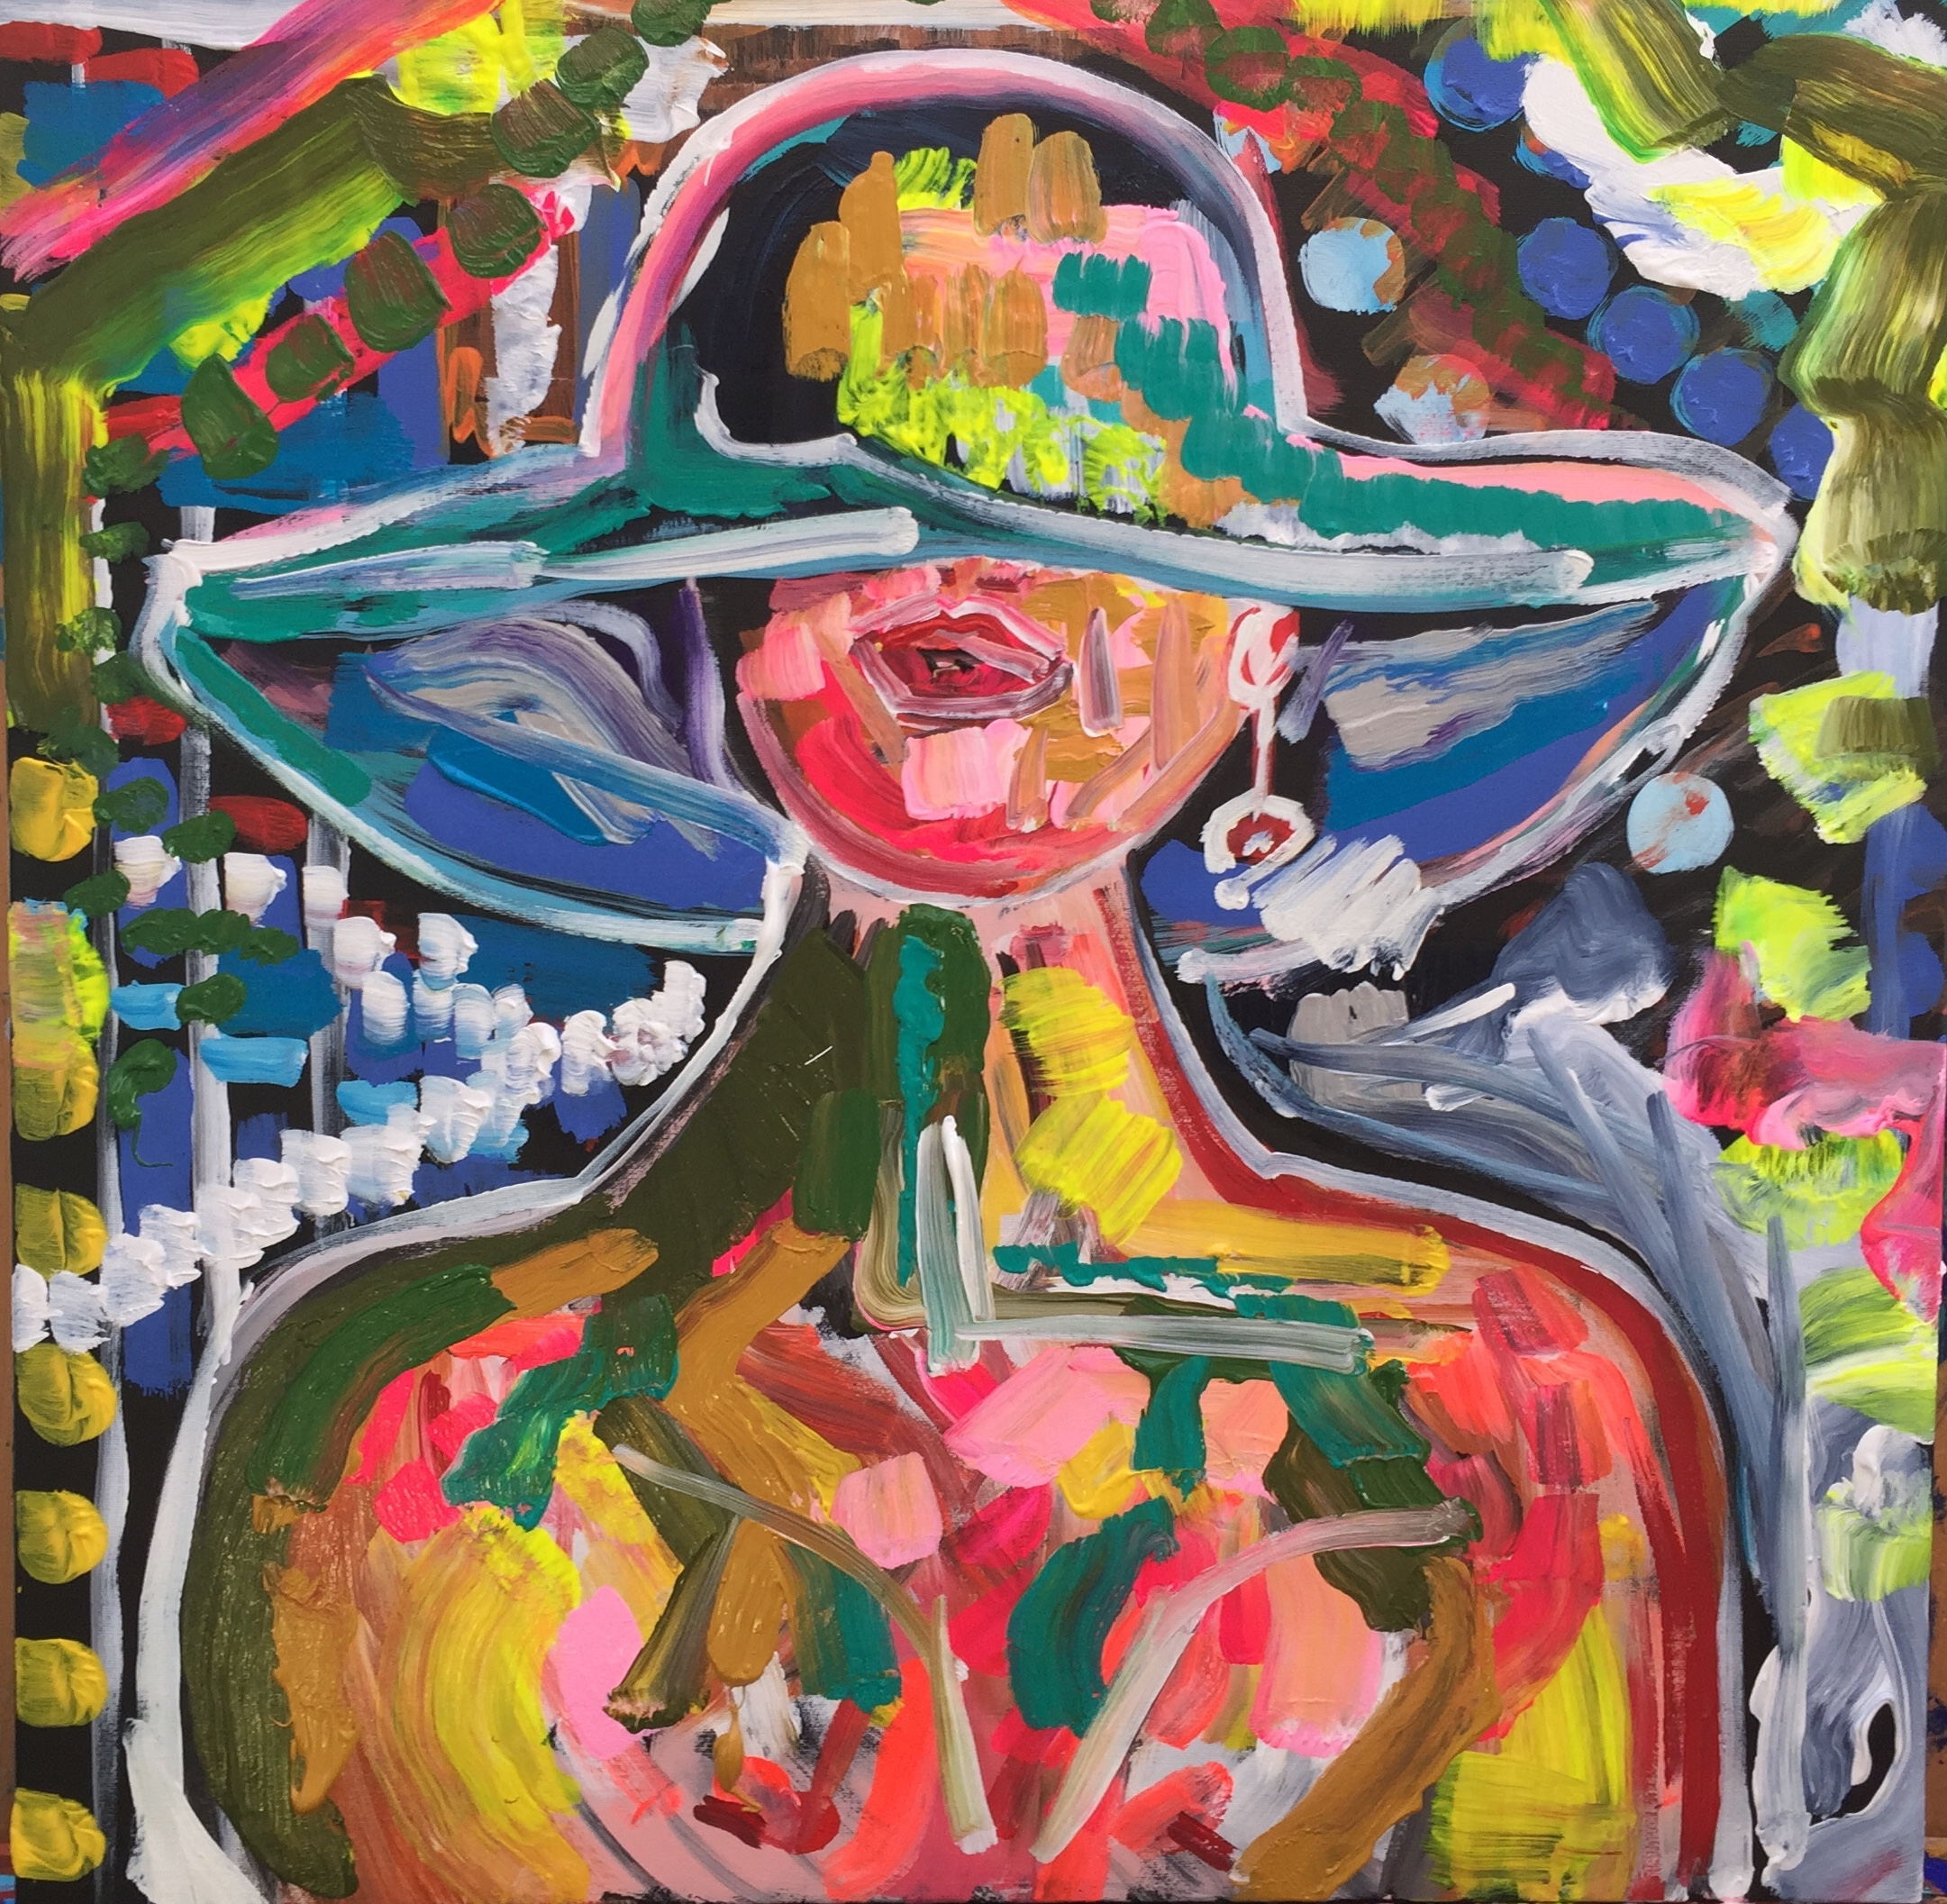 hat and earring, acrylic on canvas, cm 50 x cm 60, Occhiobello, 2019